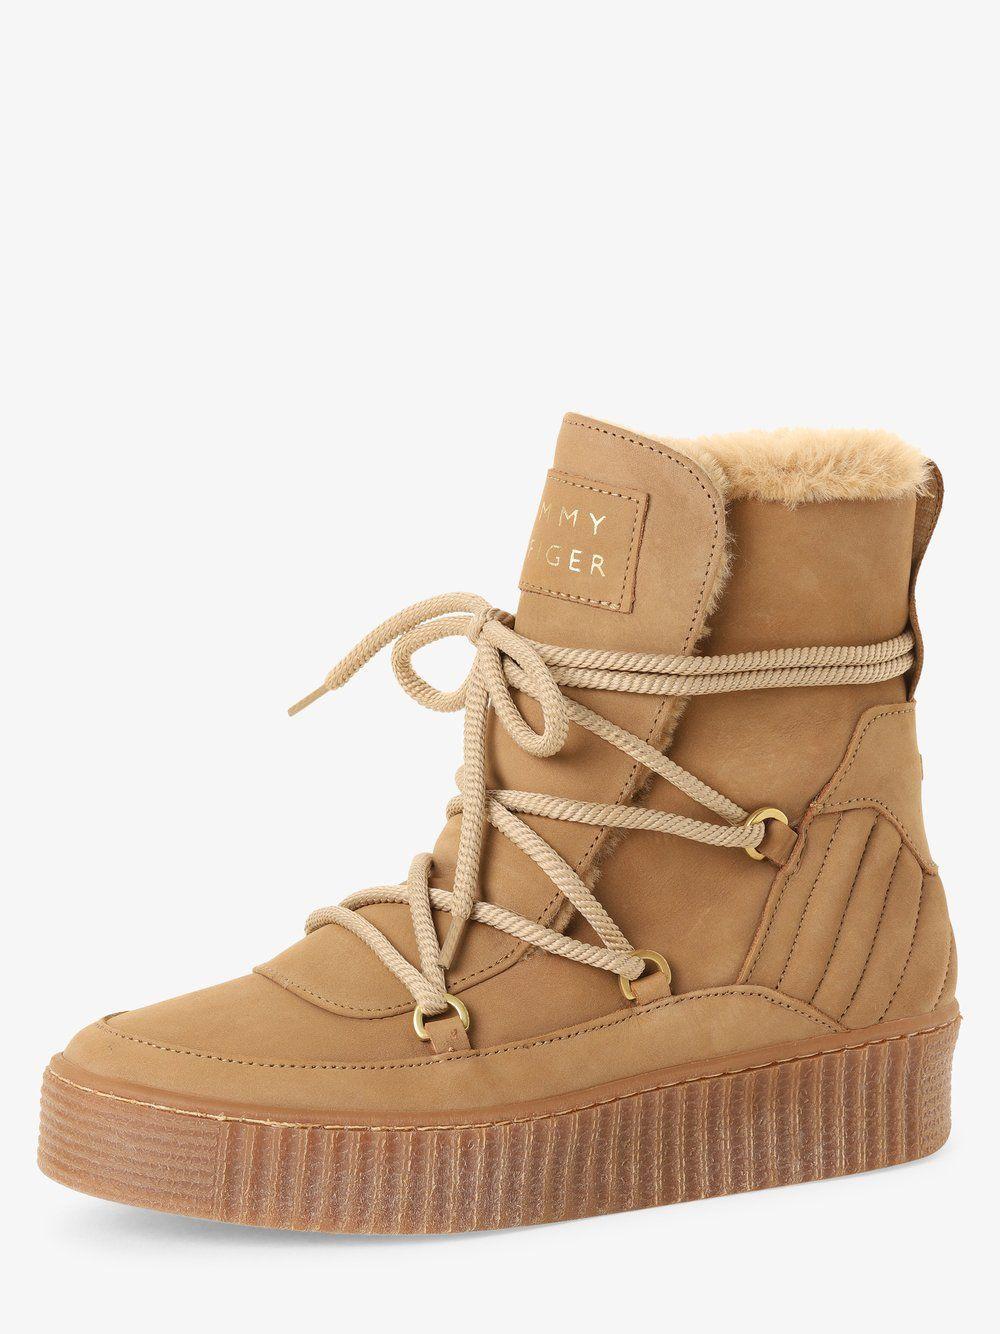 Damen Boots Aus Leder In 2020 Tommy Hilfiger Boots Boots Tommy Hilfiger